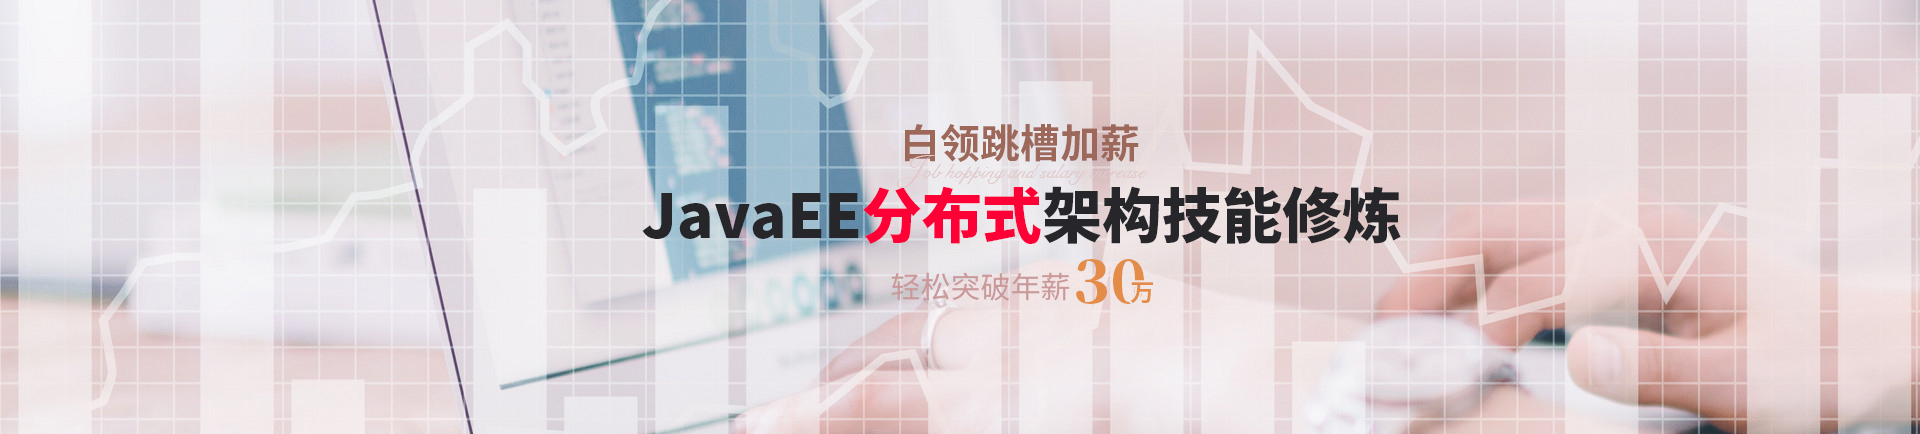 JavaEE分布�架构技能修炼 轻��破年薪30万-hebei